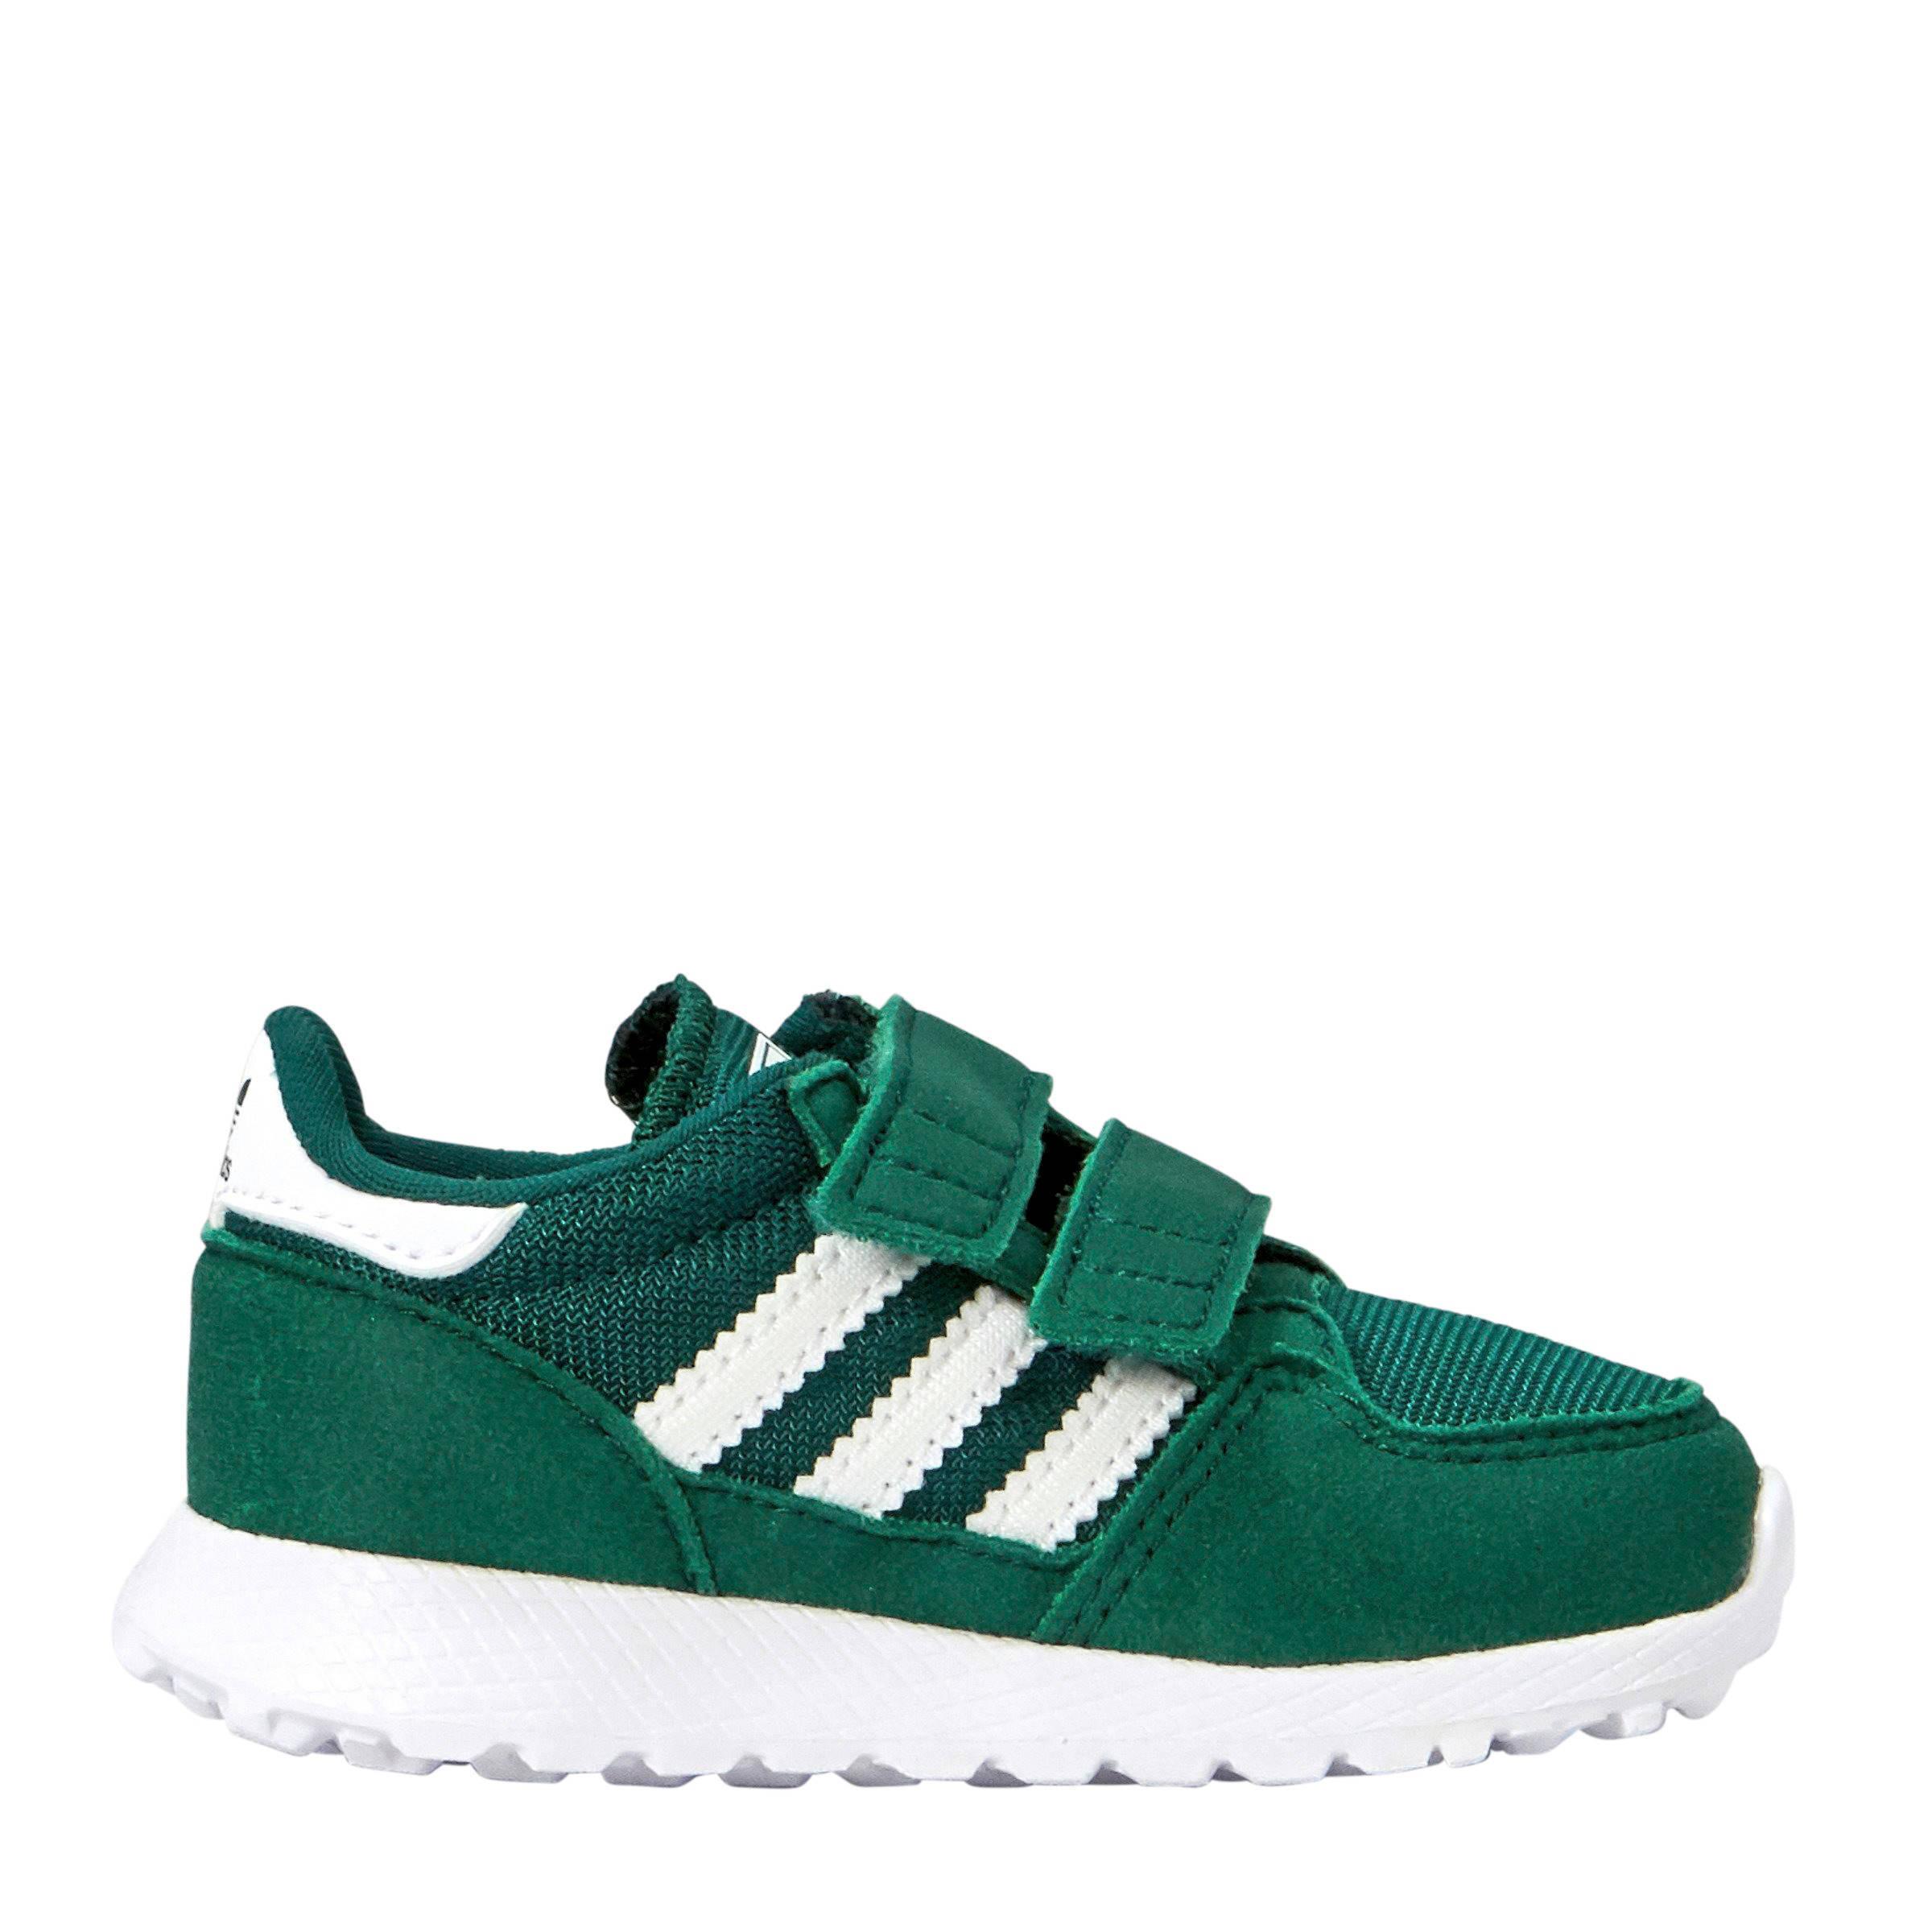 adidas Forest Grove W Groen Dames Adidas | Forest Grove